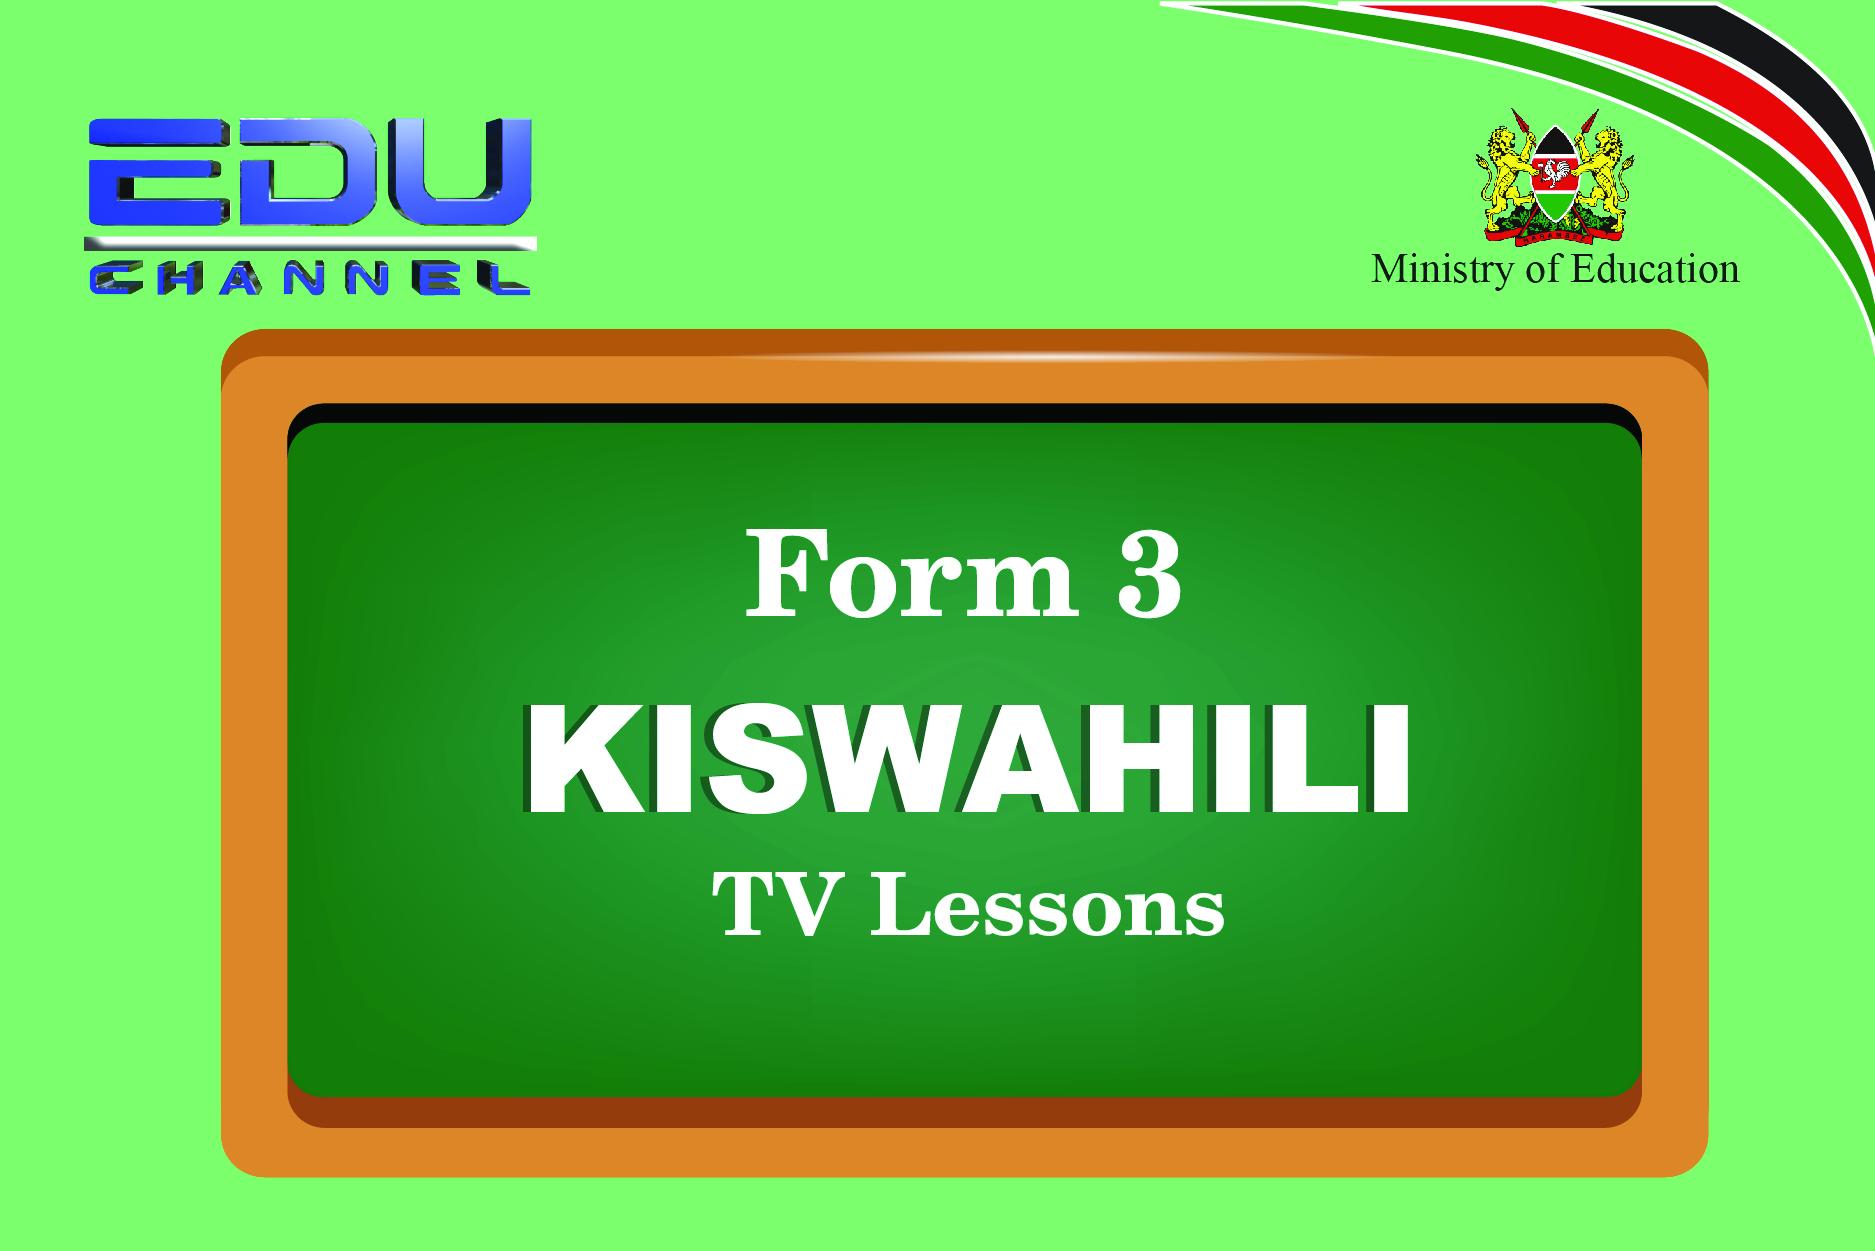 Form 3 Kiswahili Lesson 2: Insha ya Mjadala